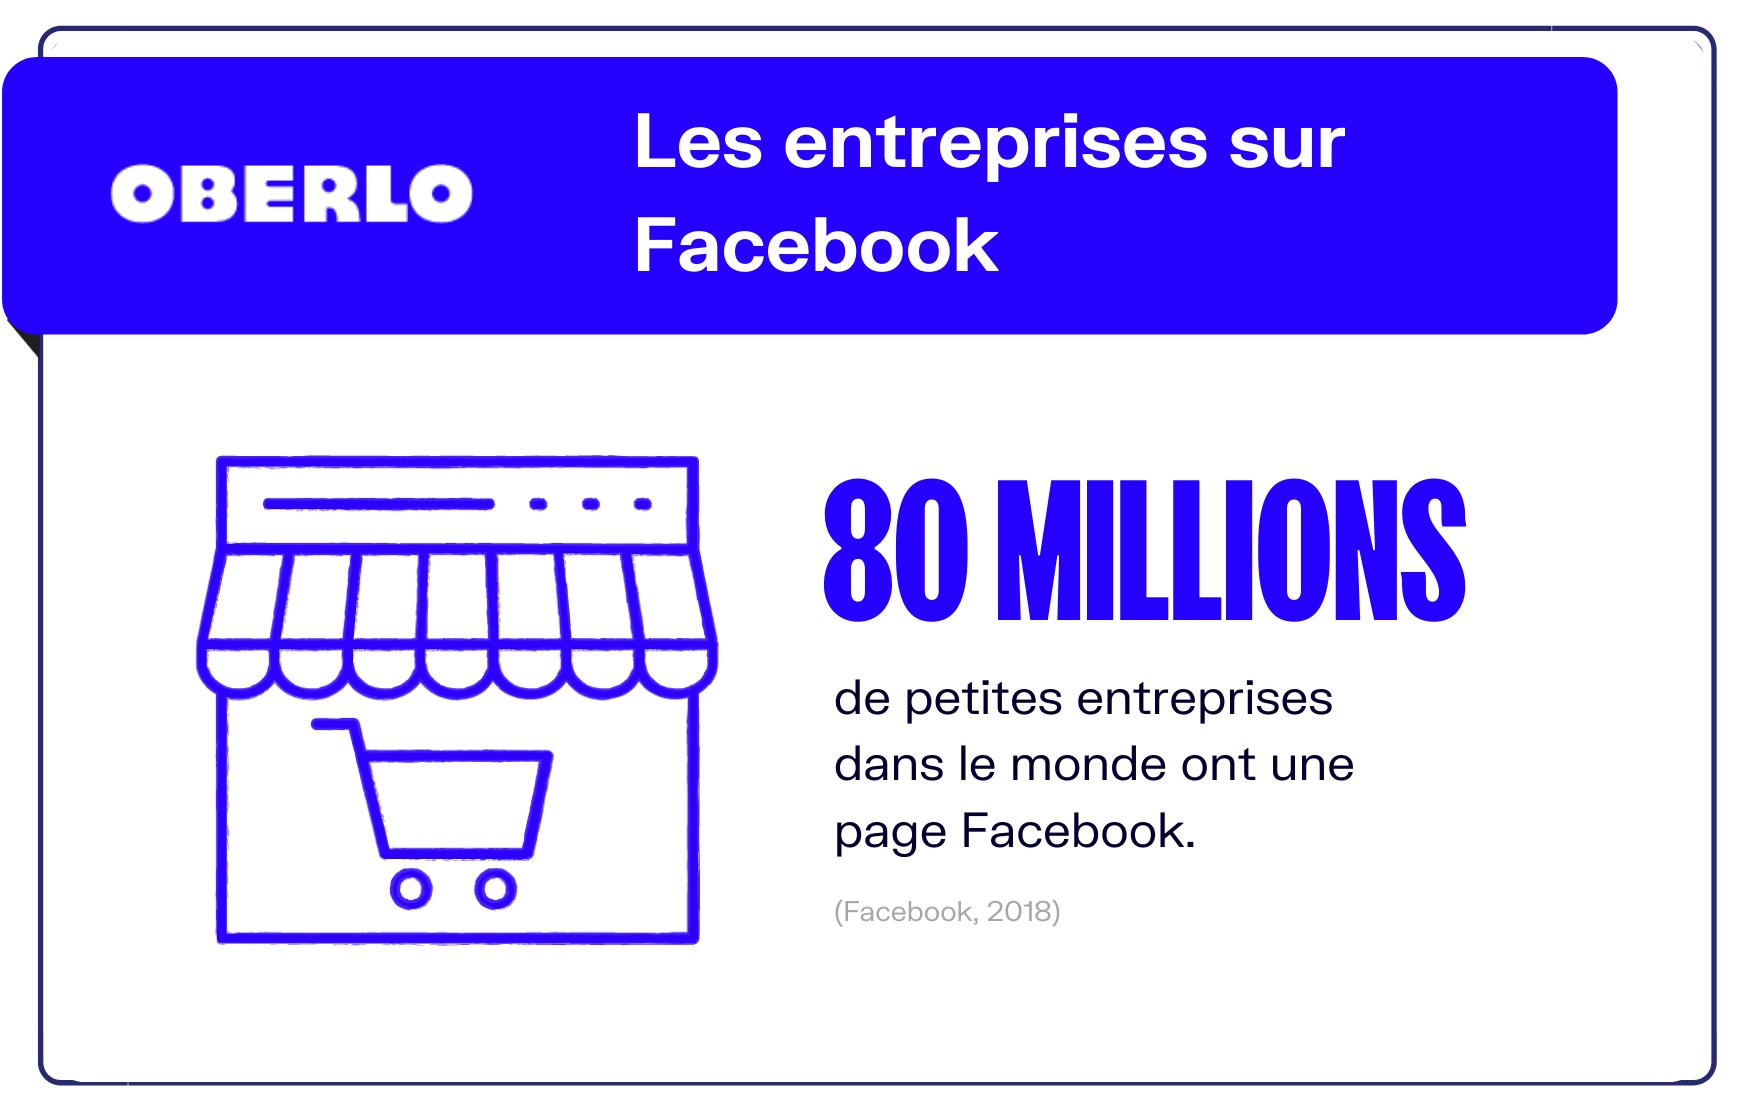 statistiques facebook entreprises